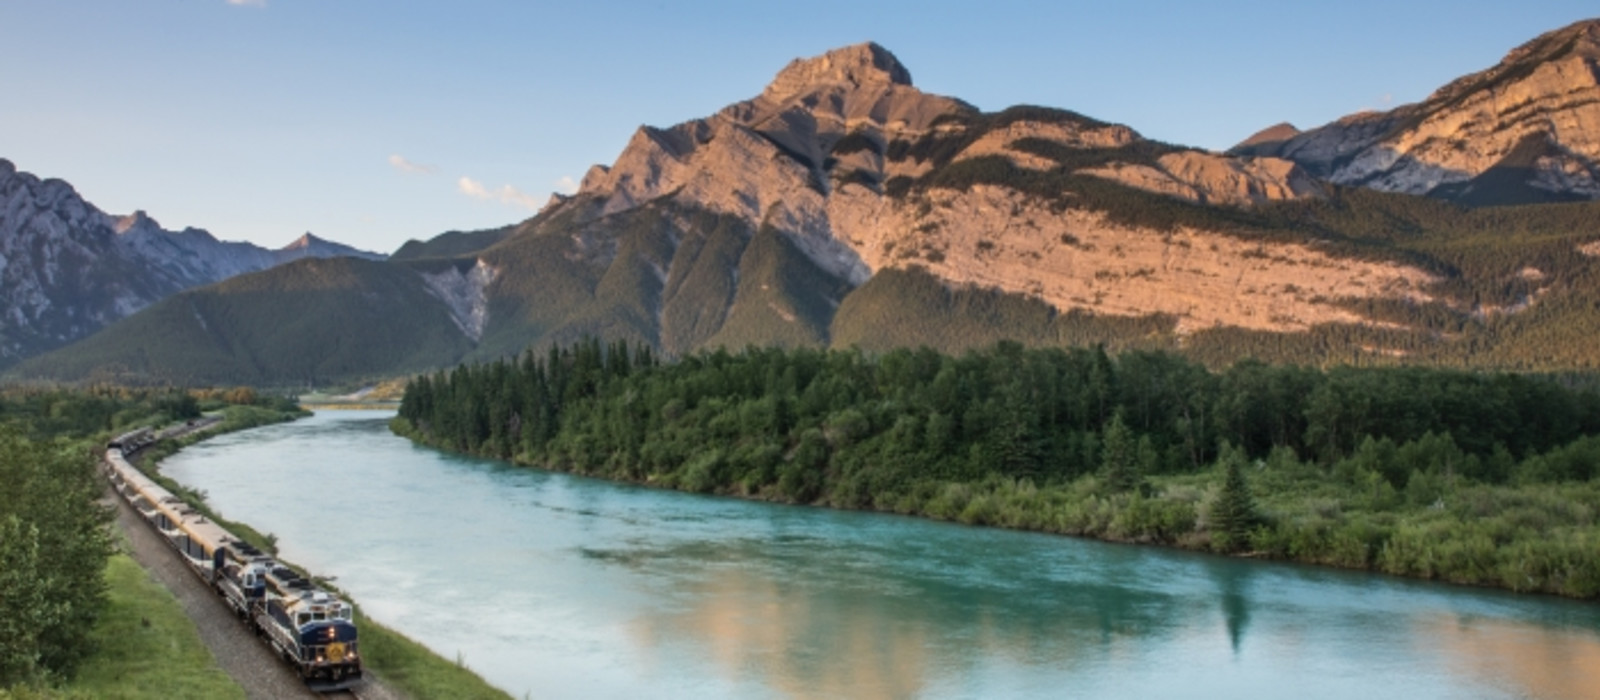 Hotel Rocky Mountaineer Whistler Kanada